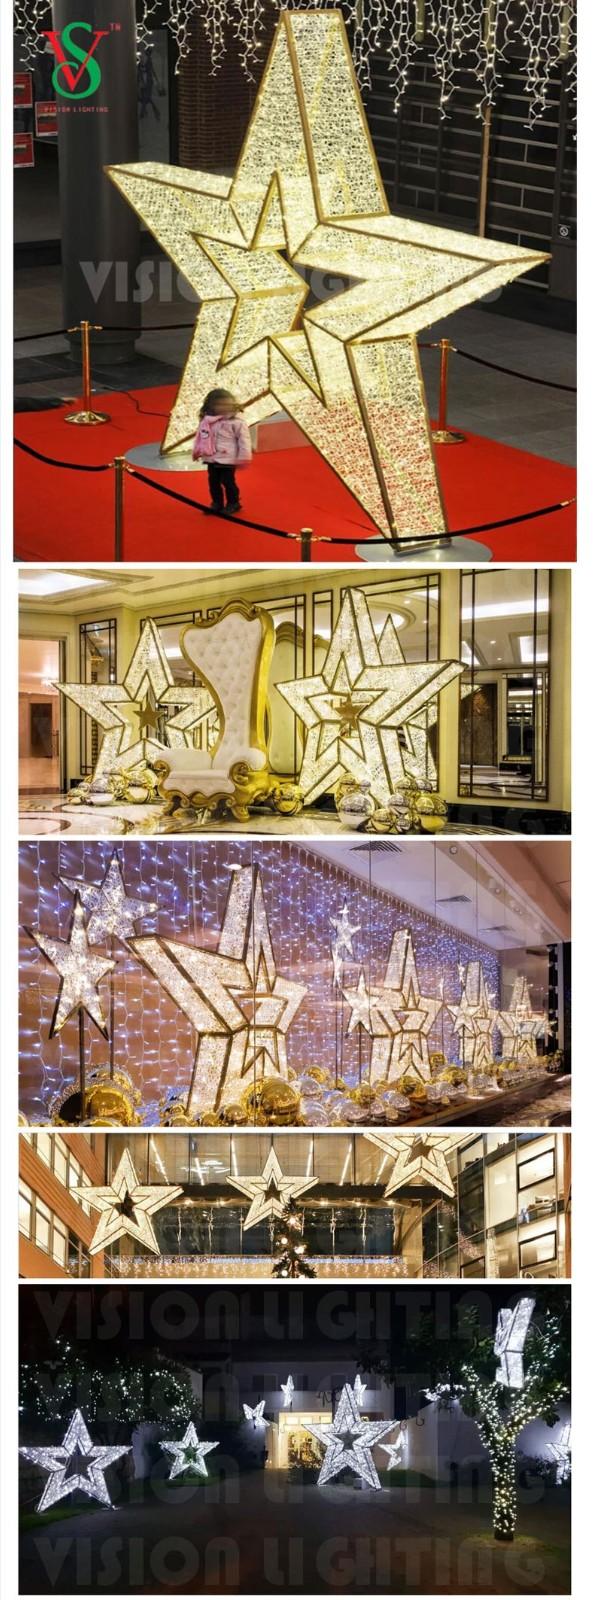 Christmas Shopping Mall Displays Decorative Illuminated Motif Malacca Lights